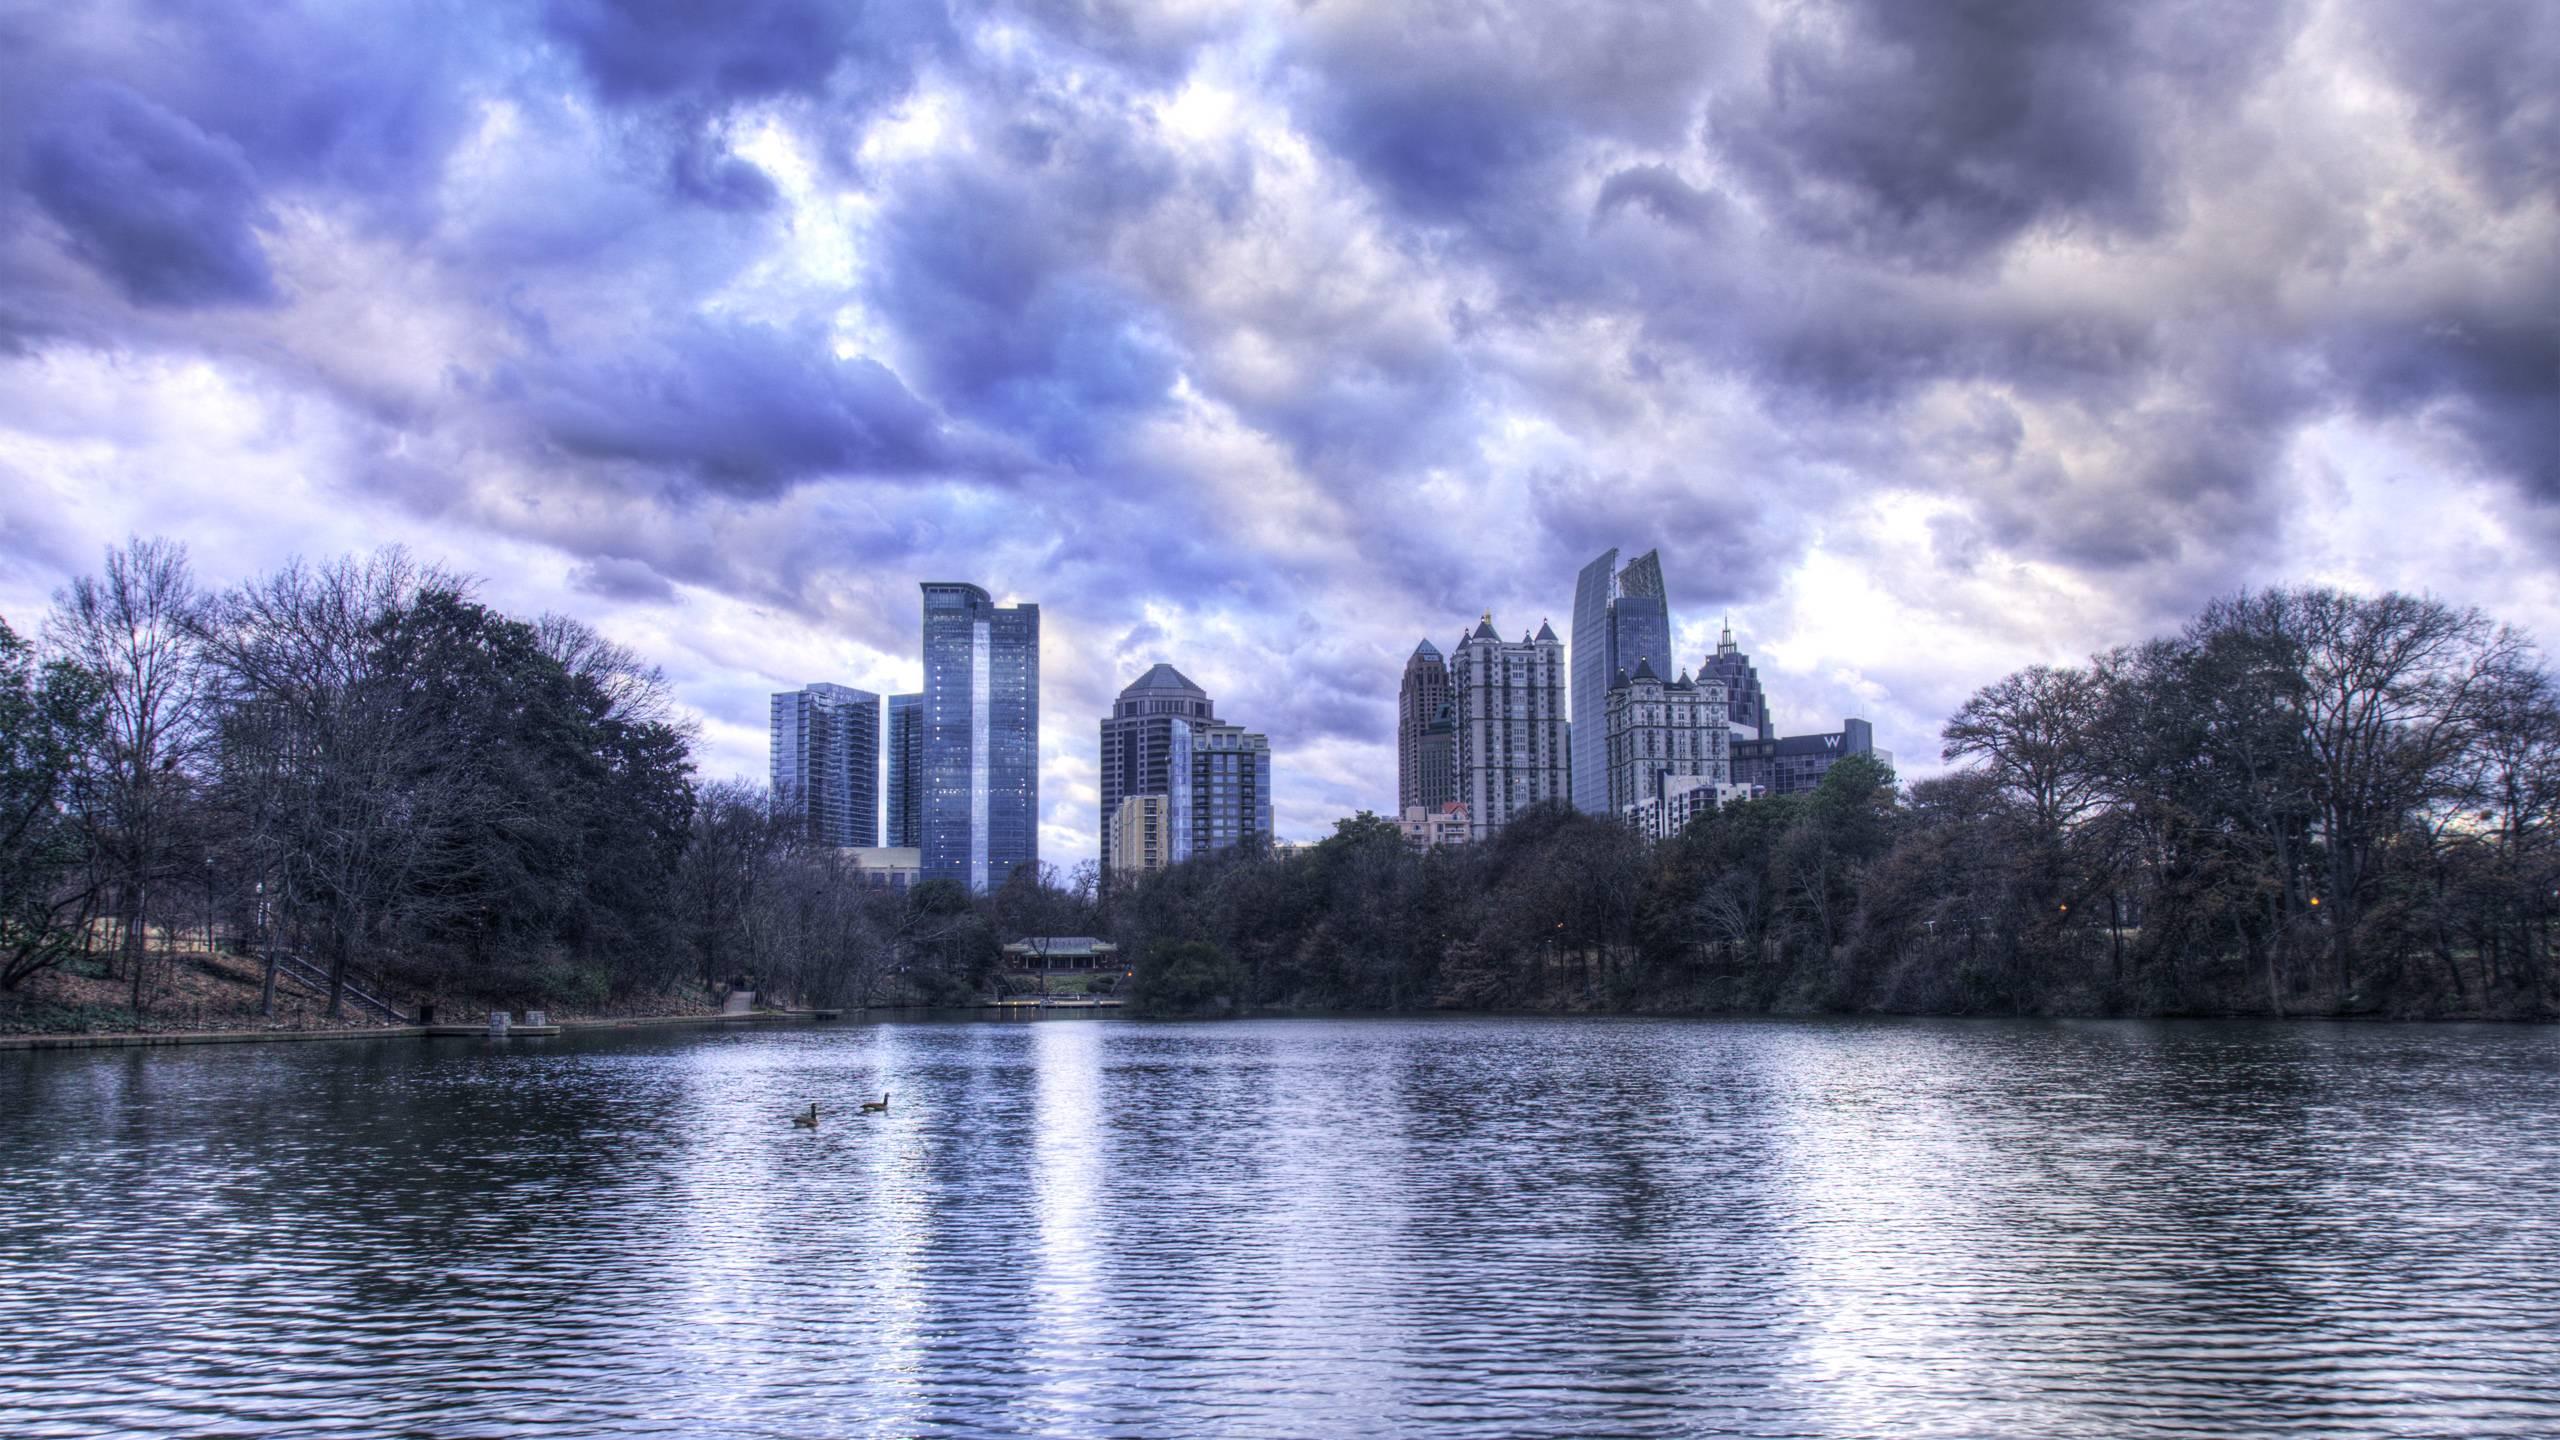 Image Result For Atlanta Skyline Wallpaper Awesome Atlanta Skyline Wallpapers Wallpaper Cave